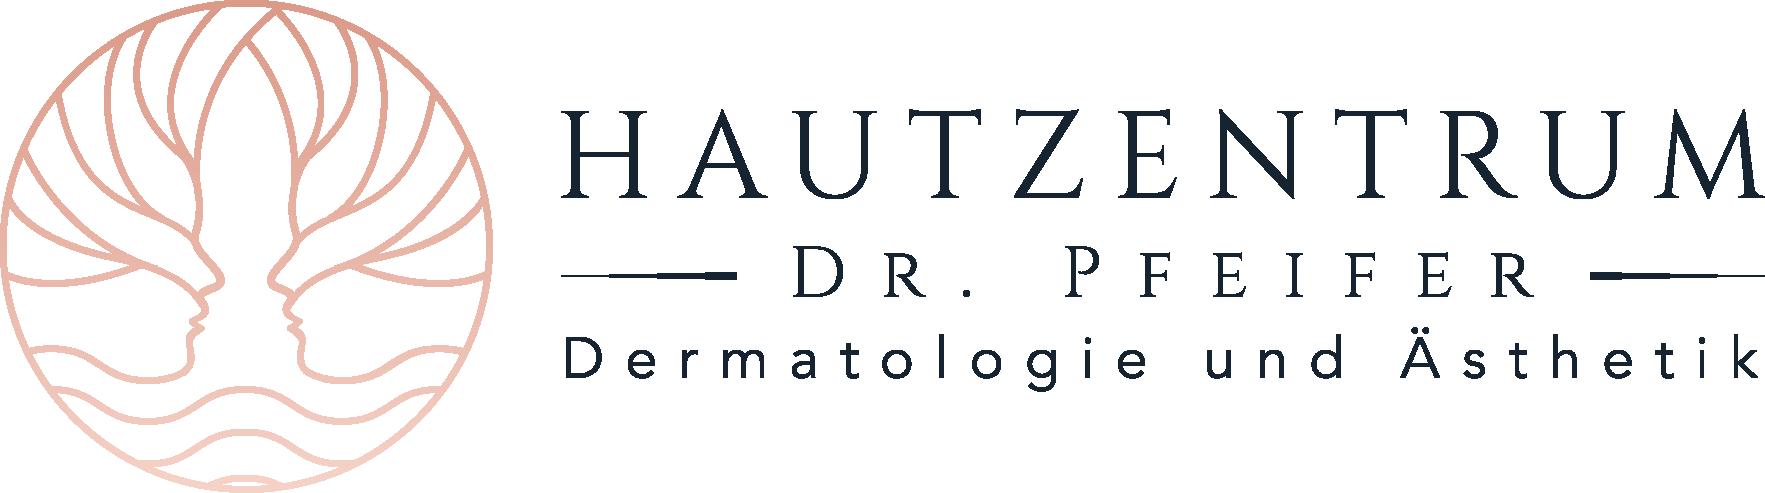 Hautzentrum Dr Pfeifer- Dermatologie und Ästhetik